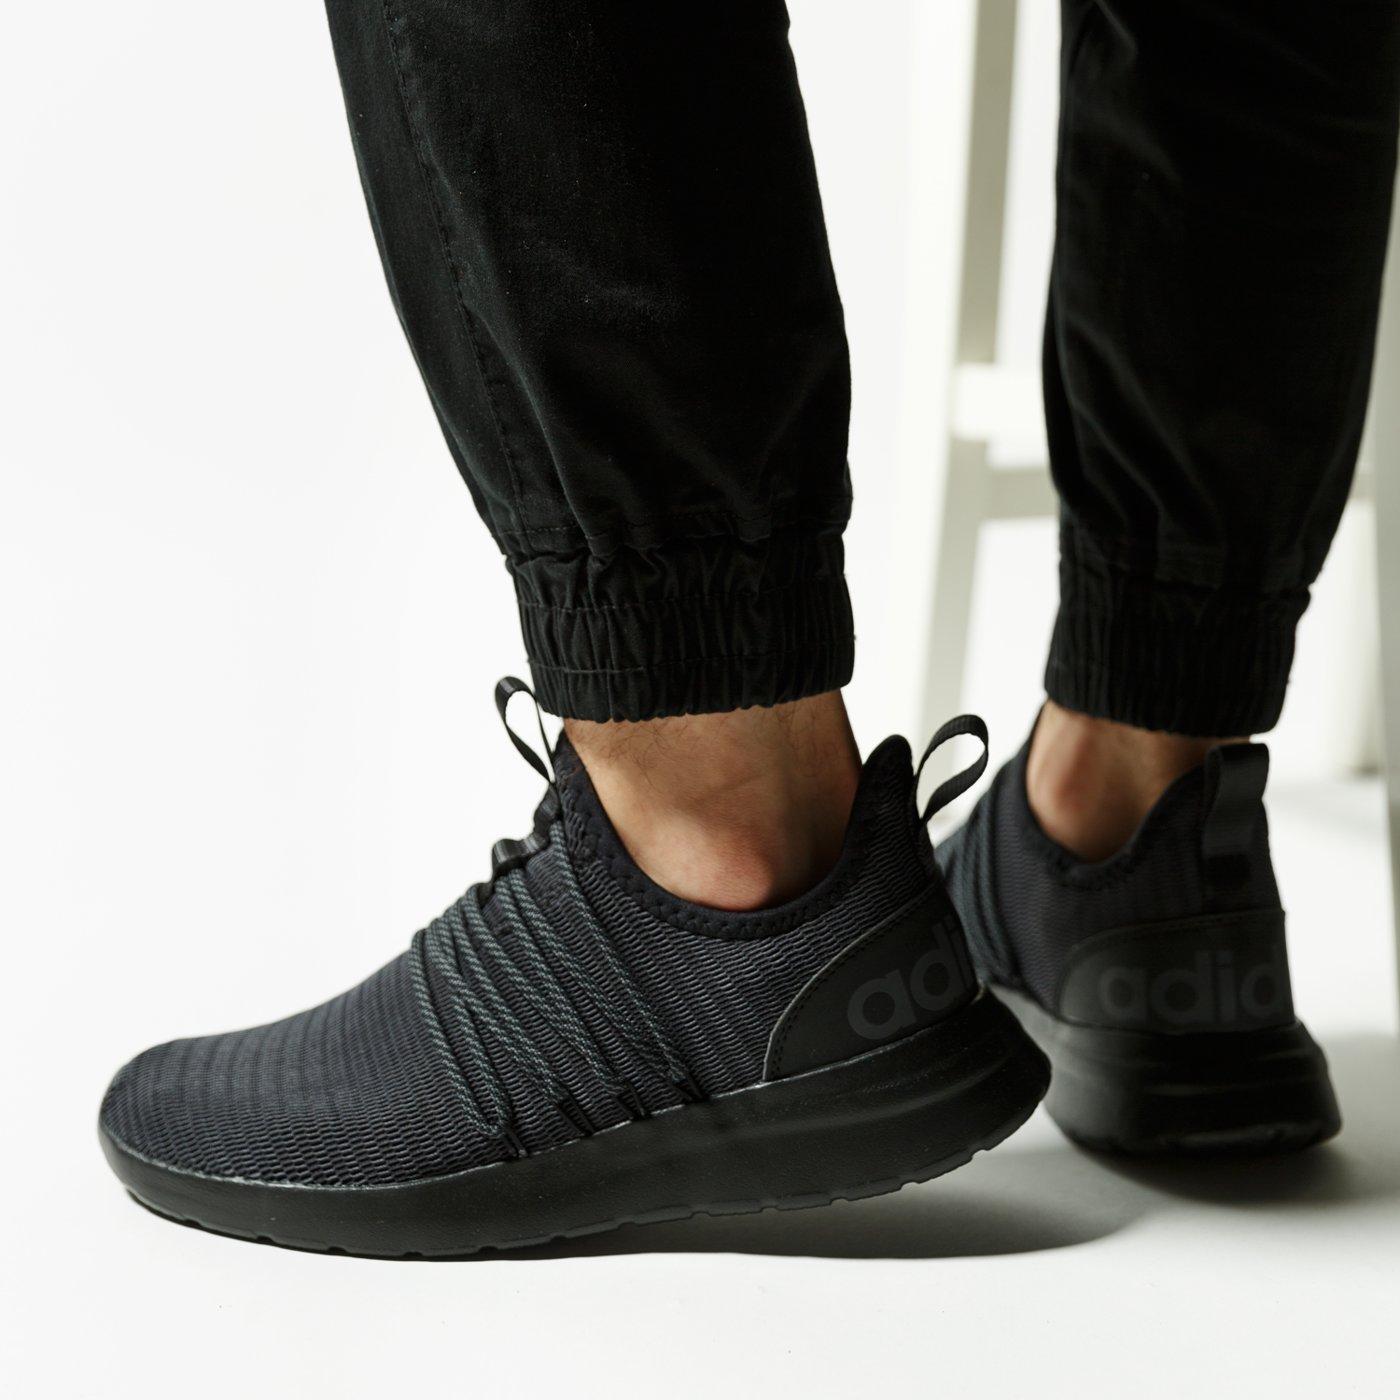 נעלי אדידס הליכה גברים Adidas Lite Racer Adapt